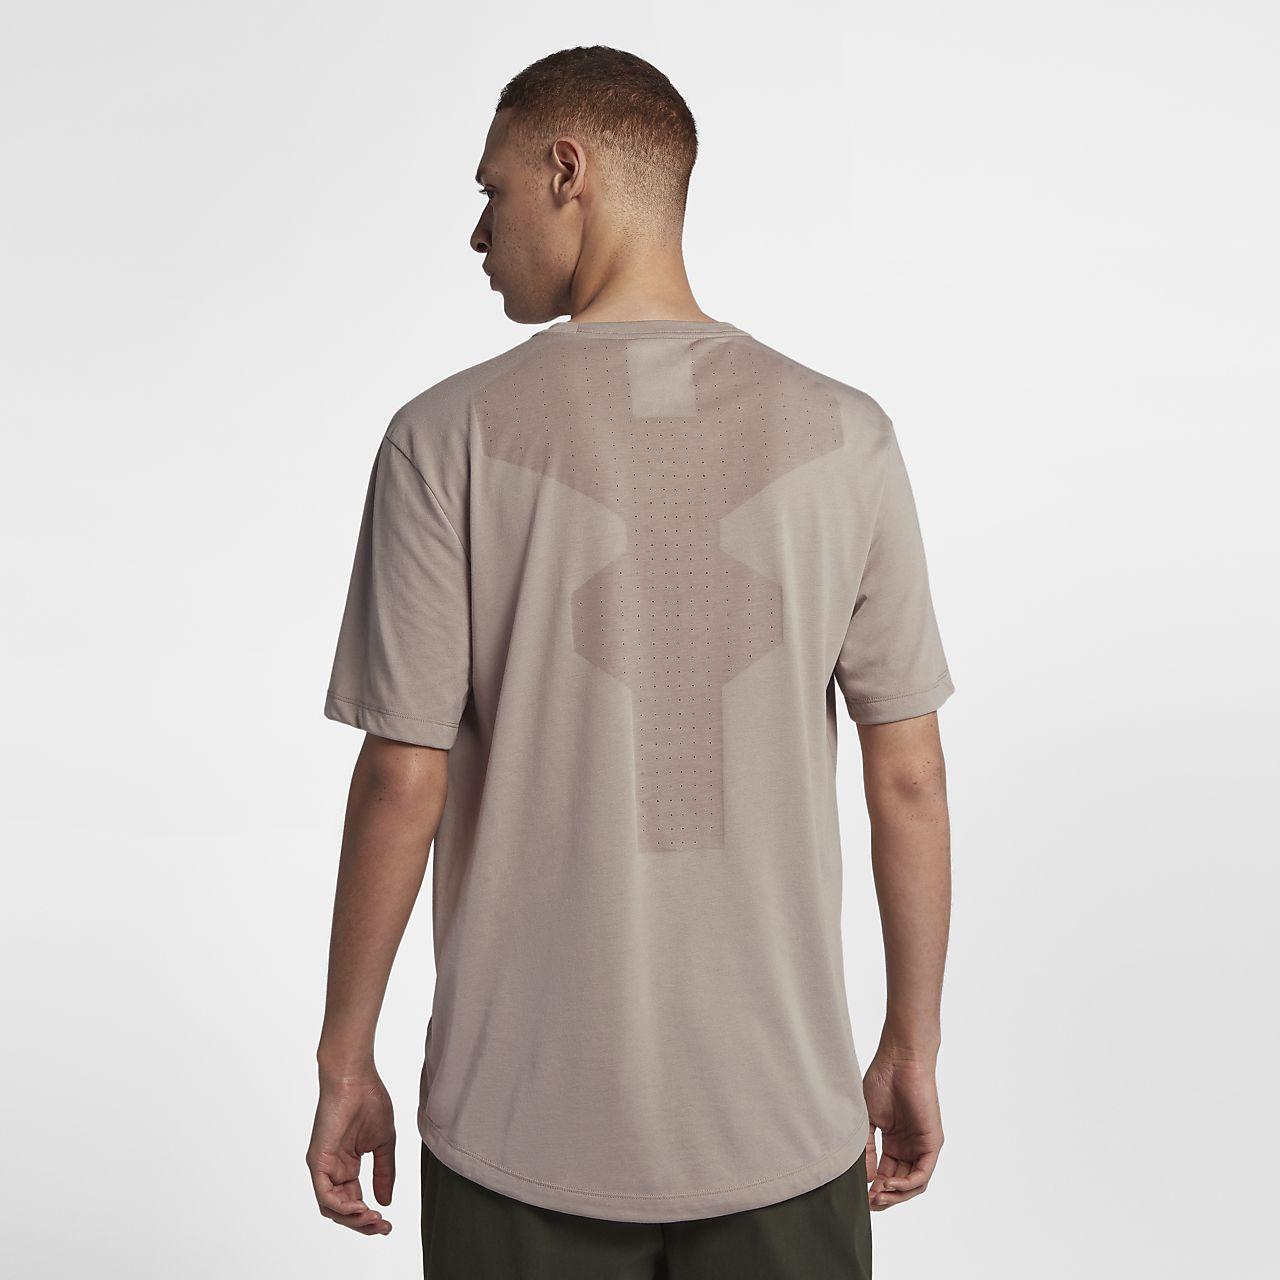 Camisola de manga curta Nike Sportswear Tech Pack